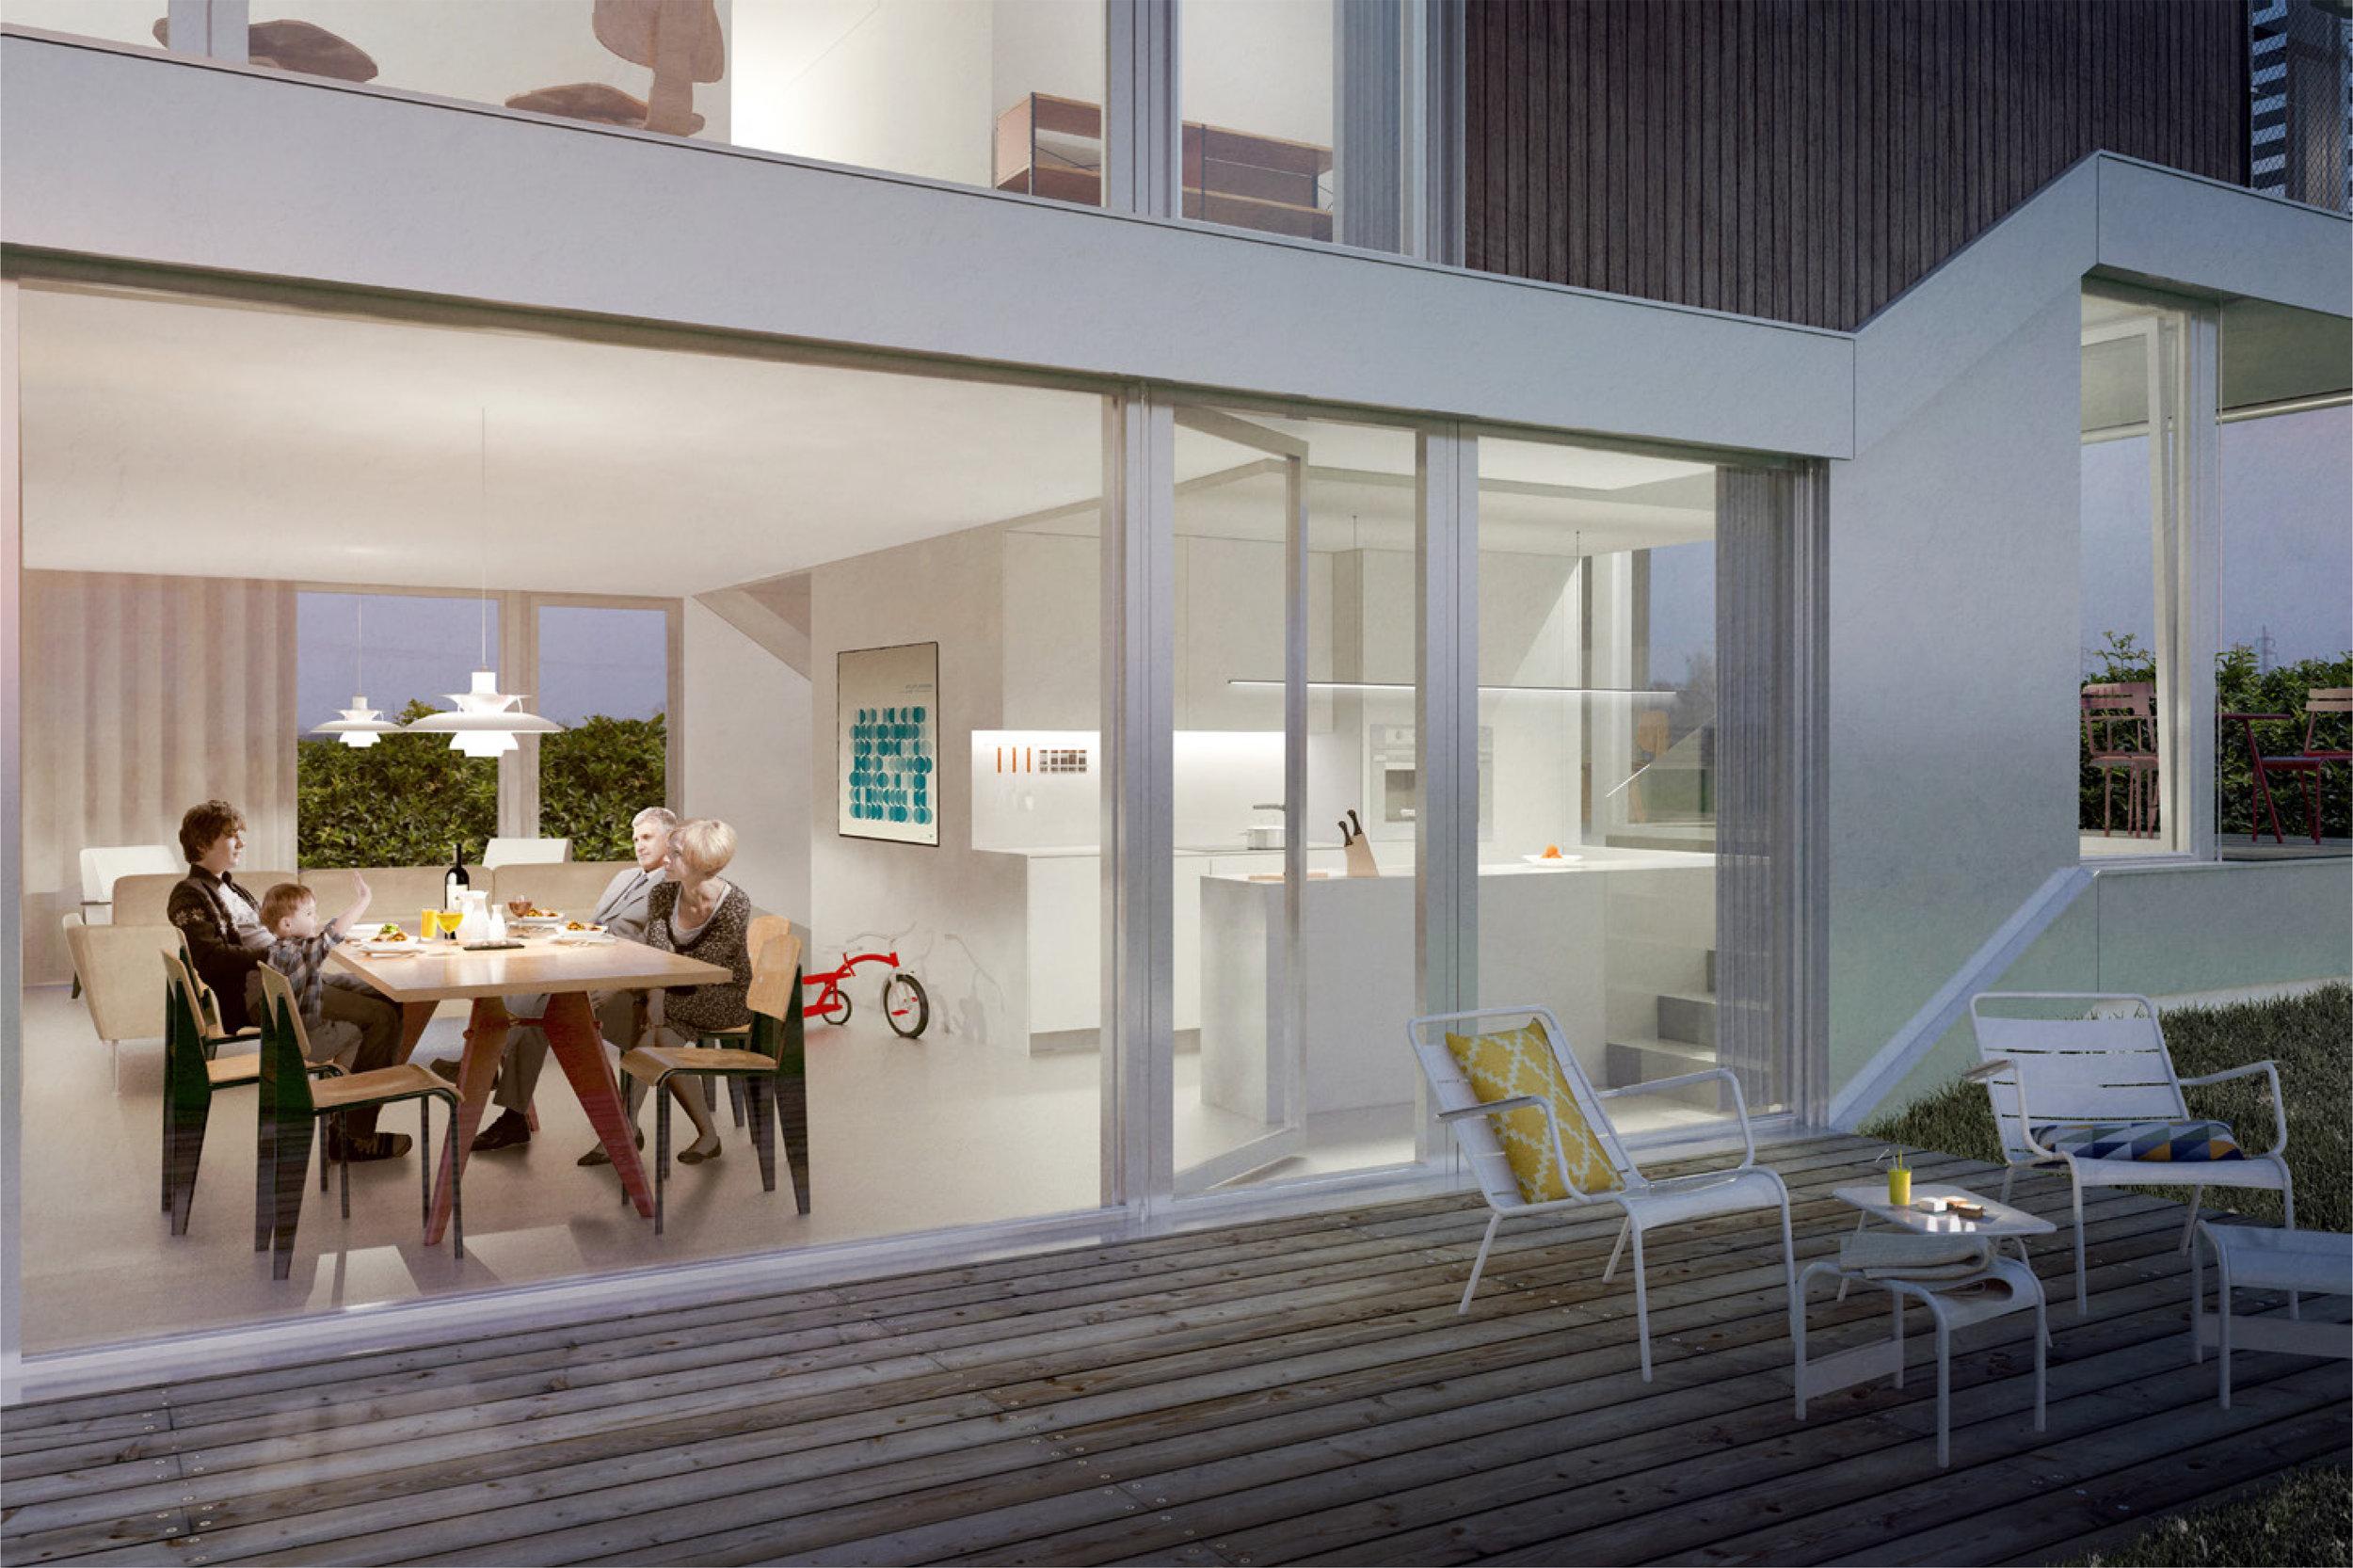 Spitzacker_Doppelhaus_Innenperspektive_Wohnzimmer.jpg